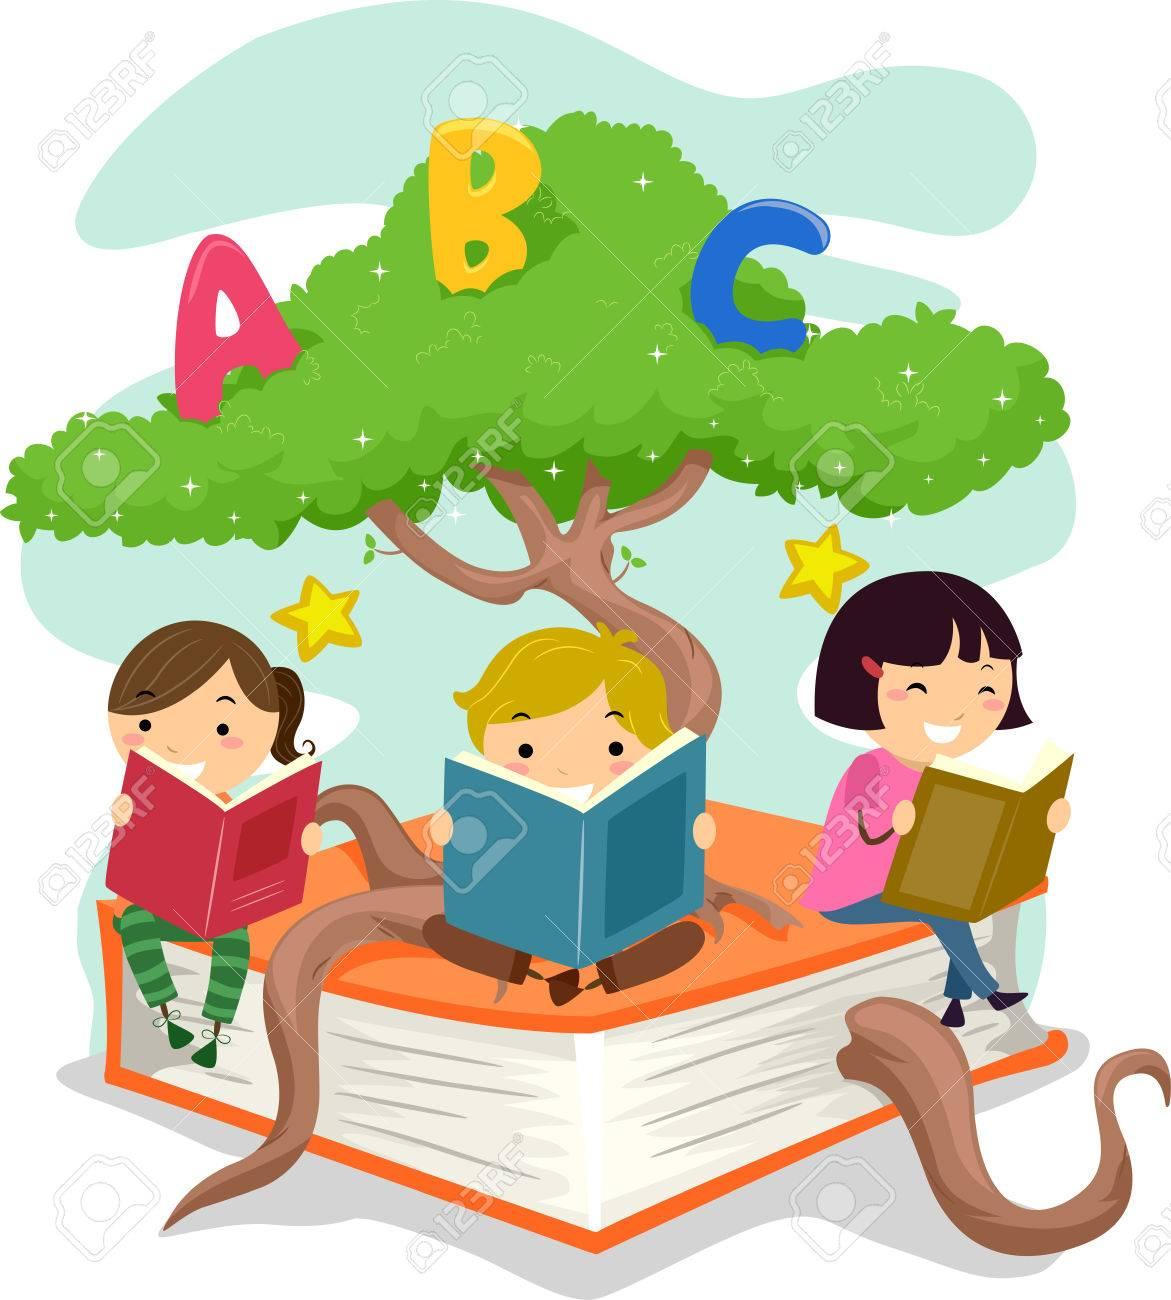 stickman illustration of kids reading books while sitting on stock